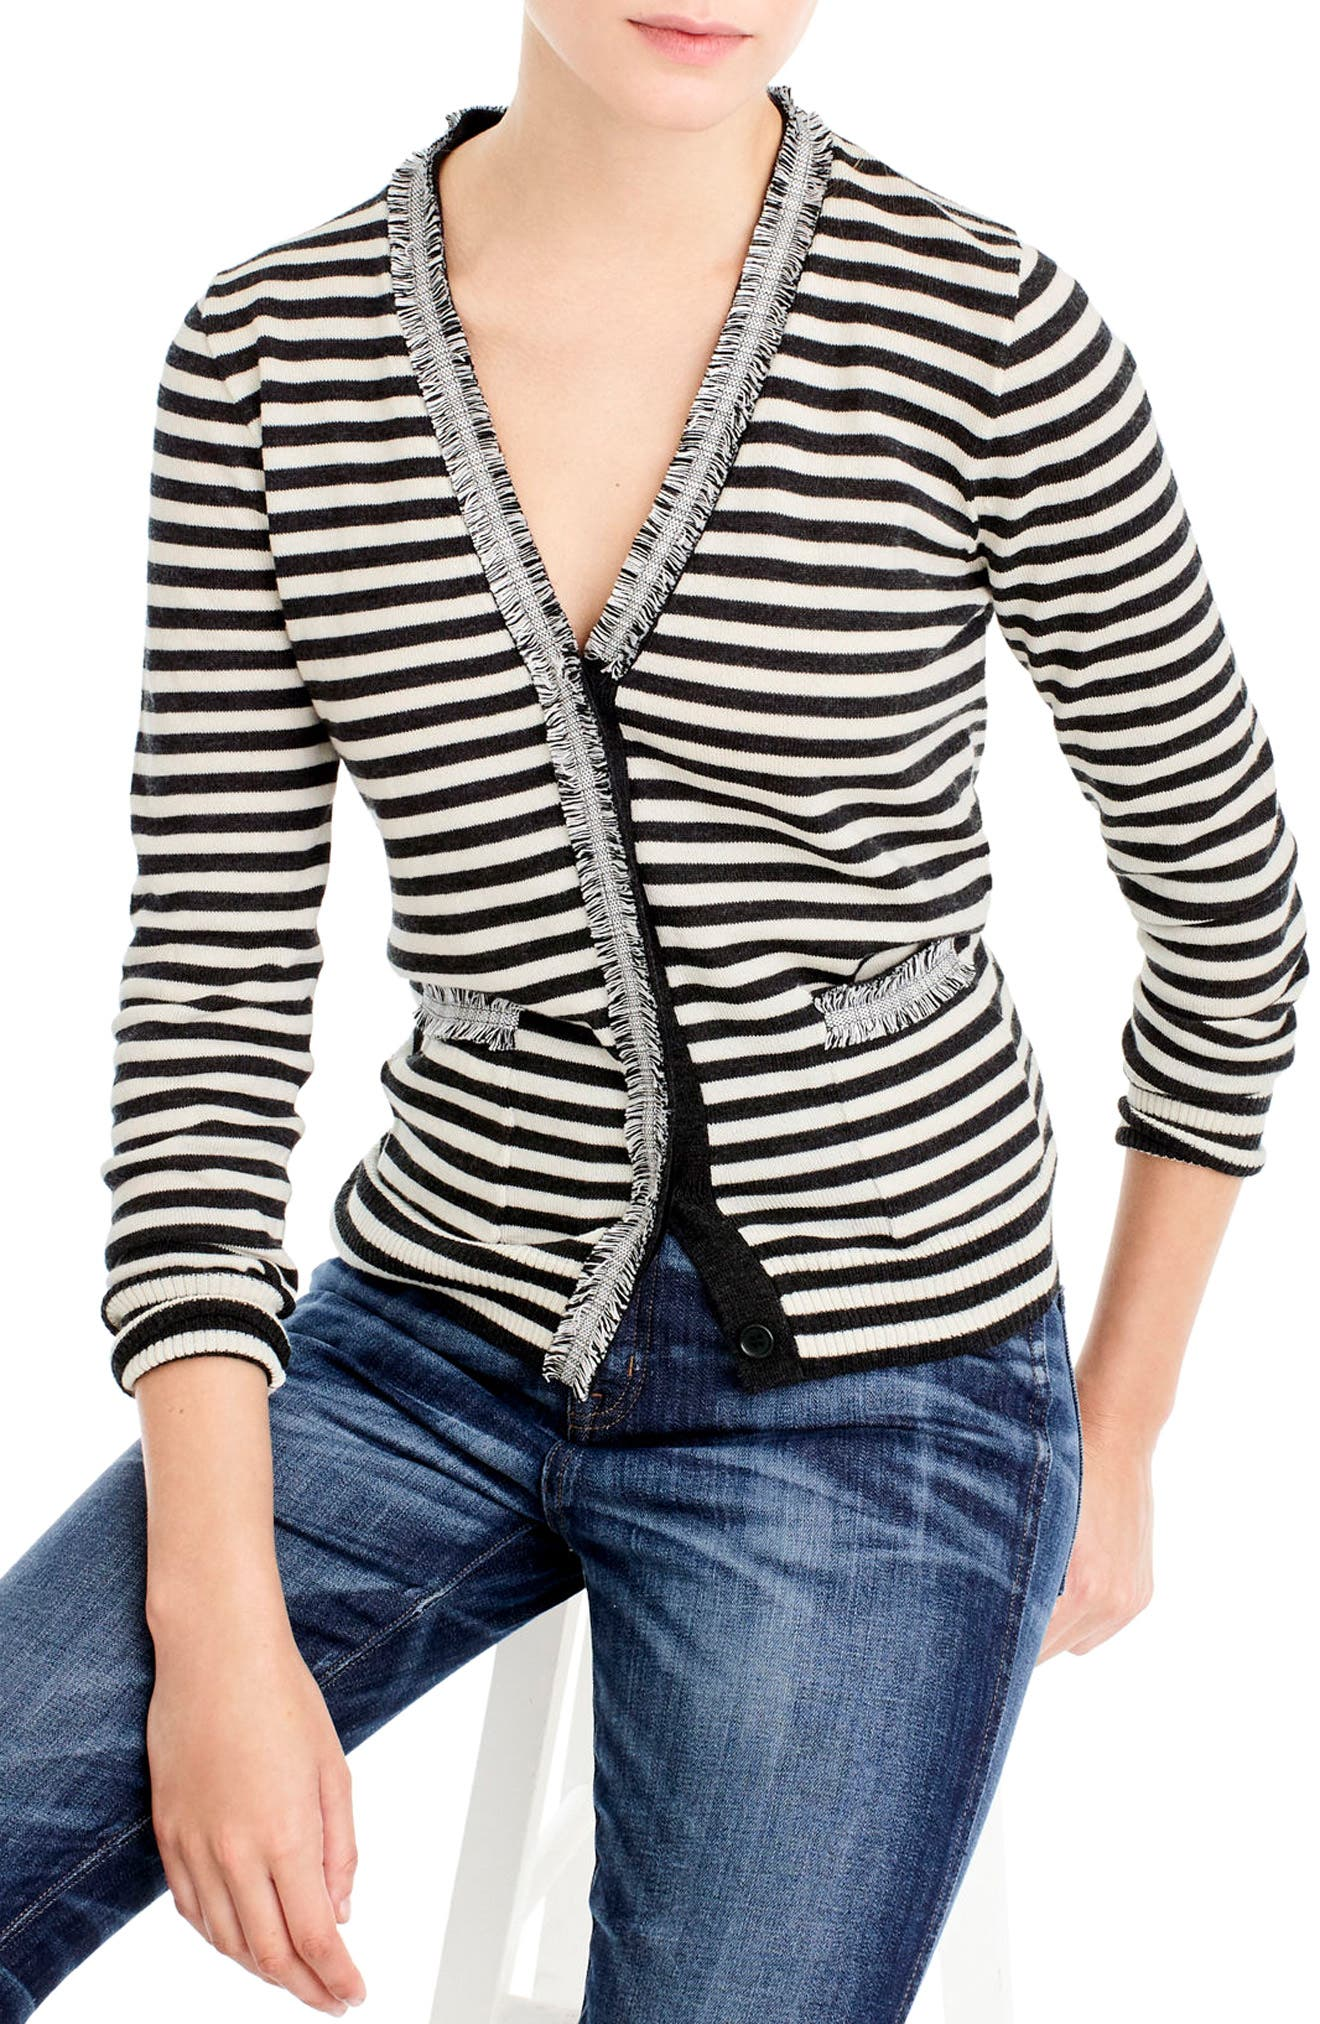 J.Crew Stripe Harlow Cardigan Sweater